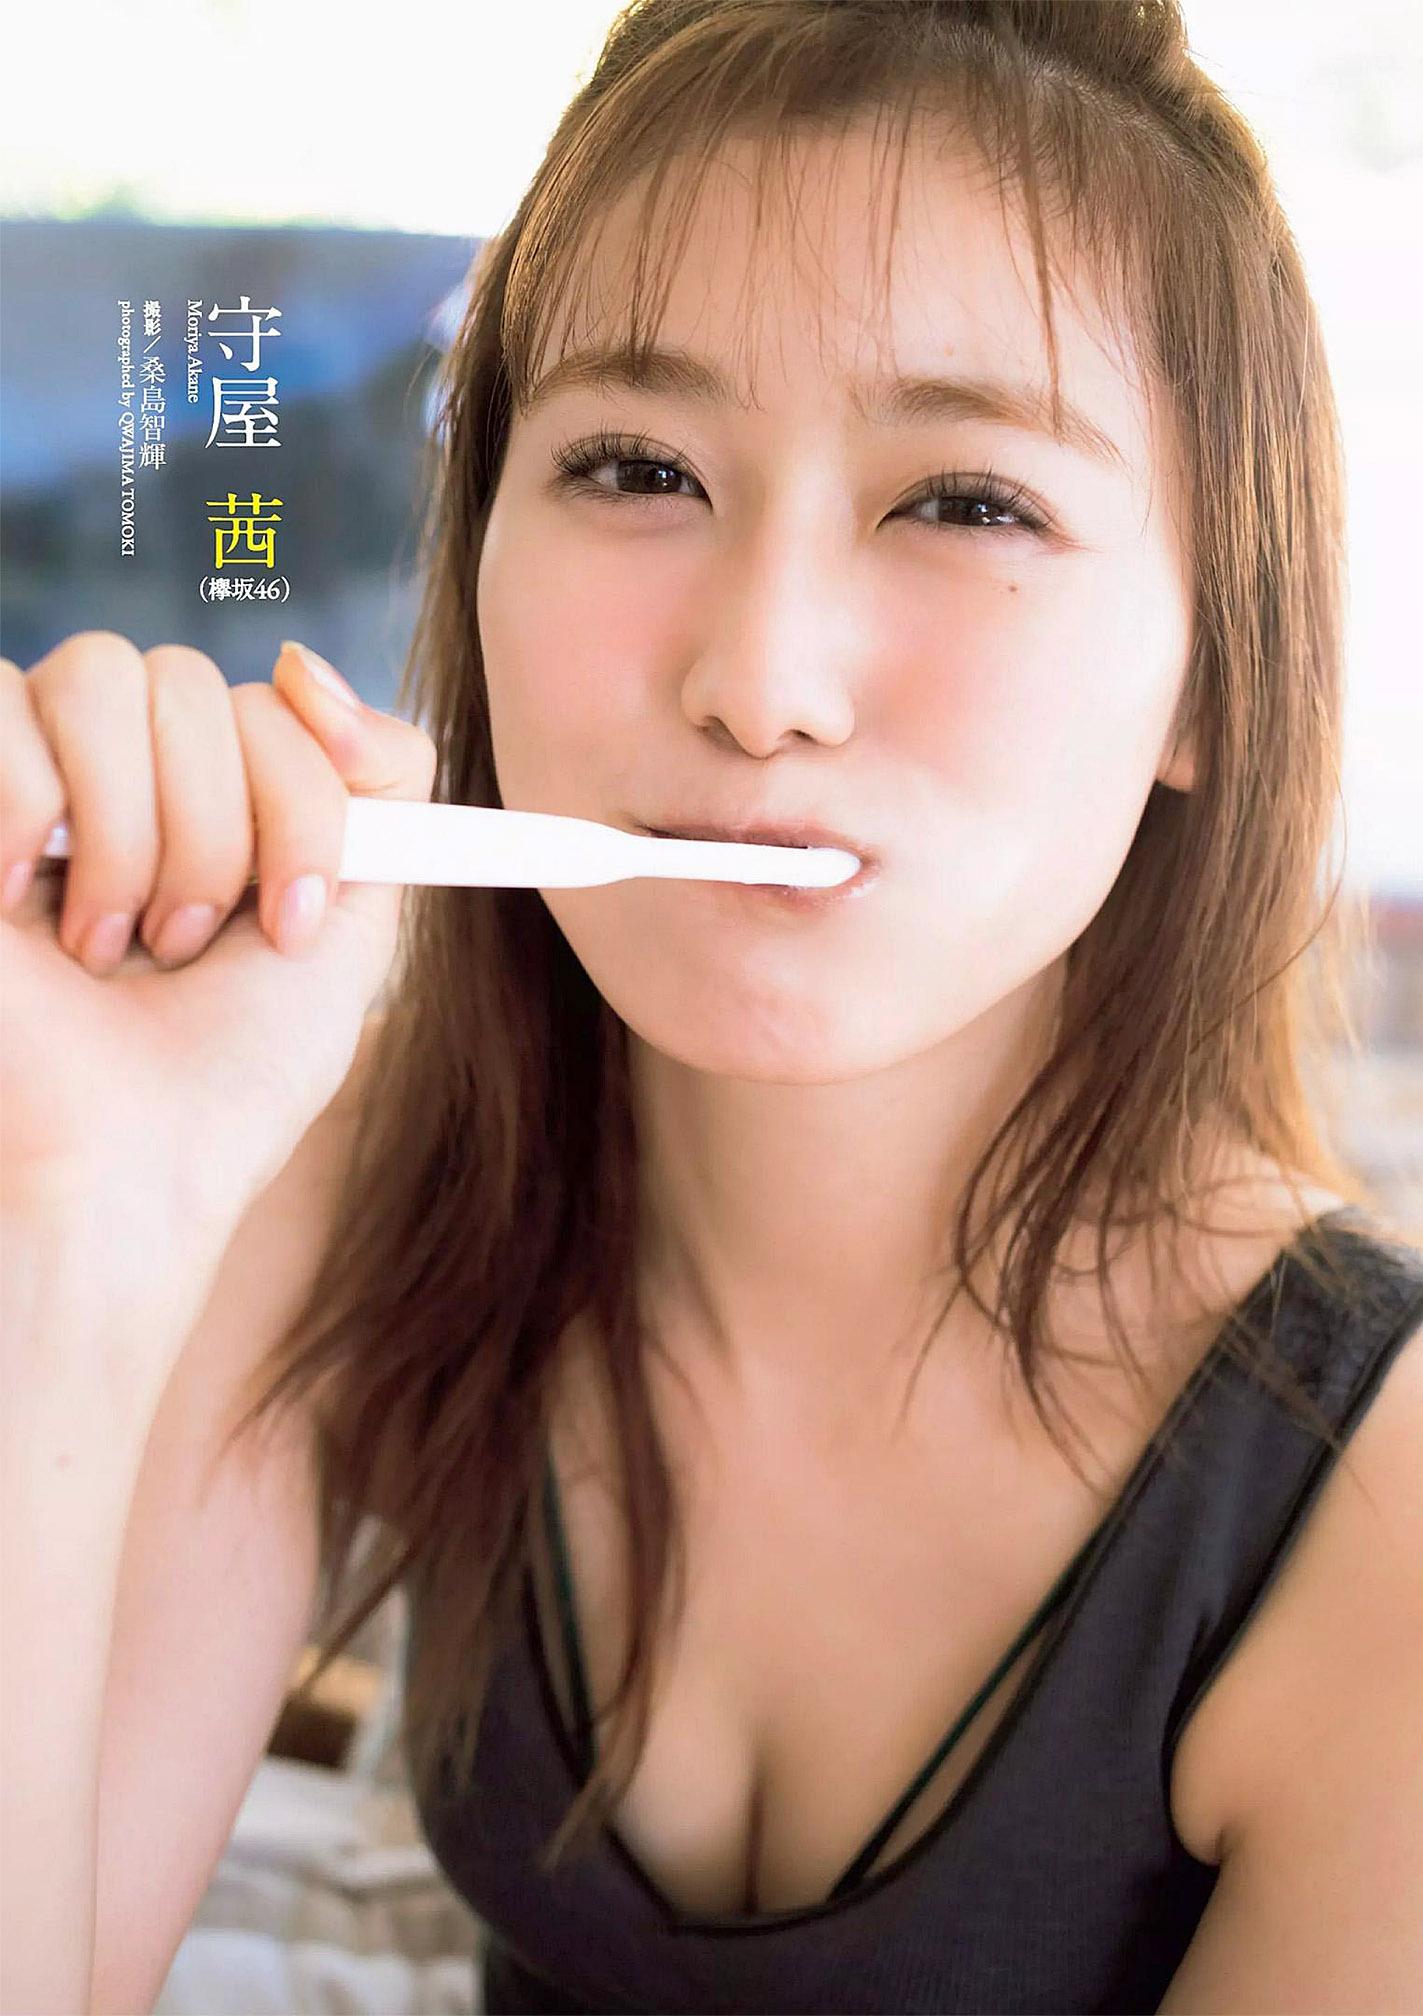 Moriya Akane K46 WPB 190624 01.jpg